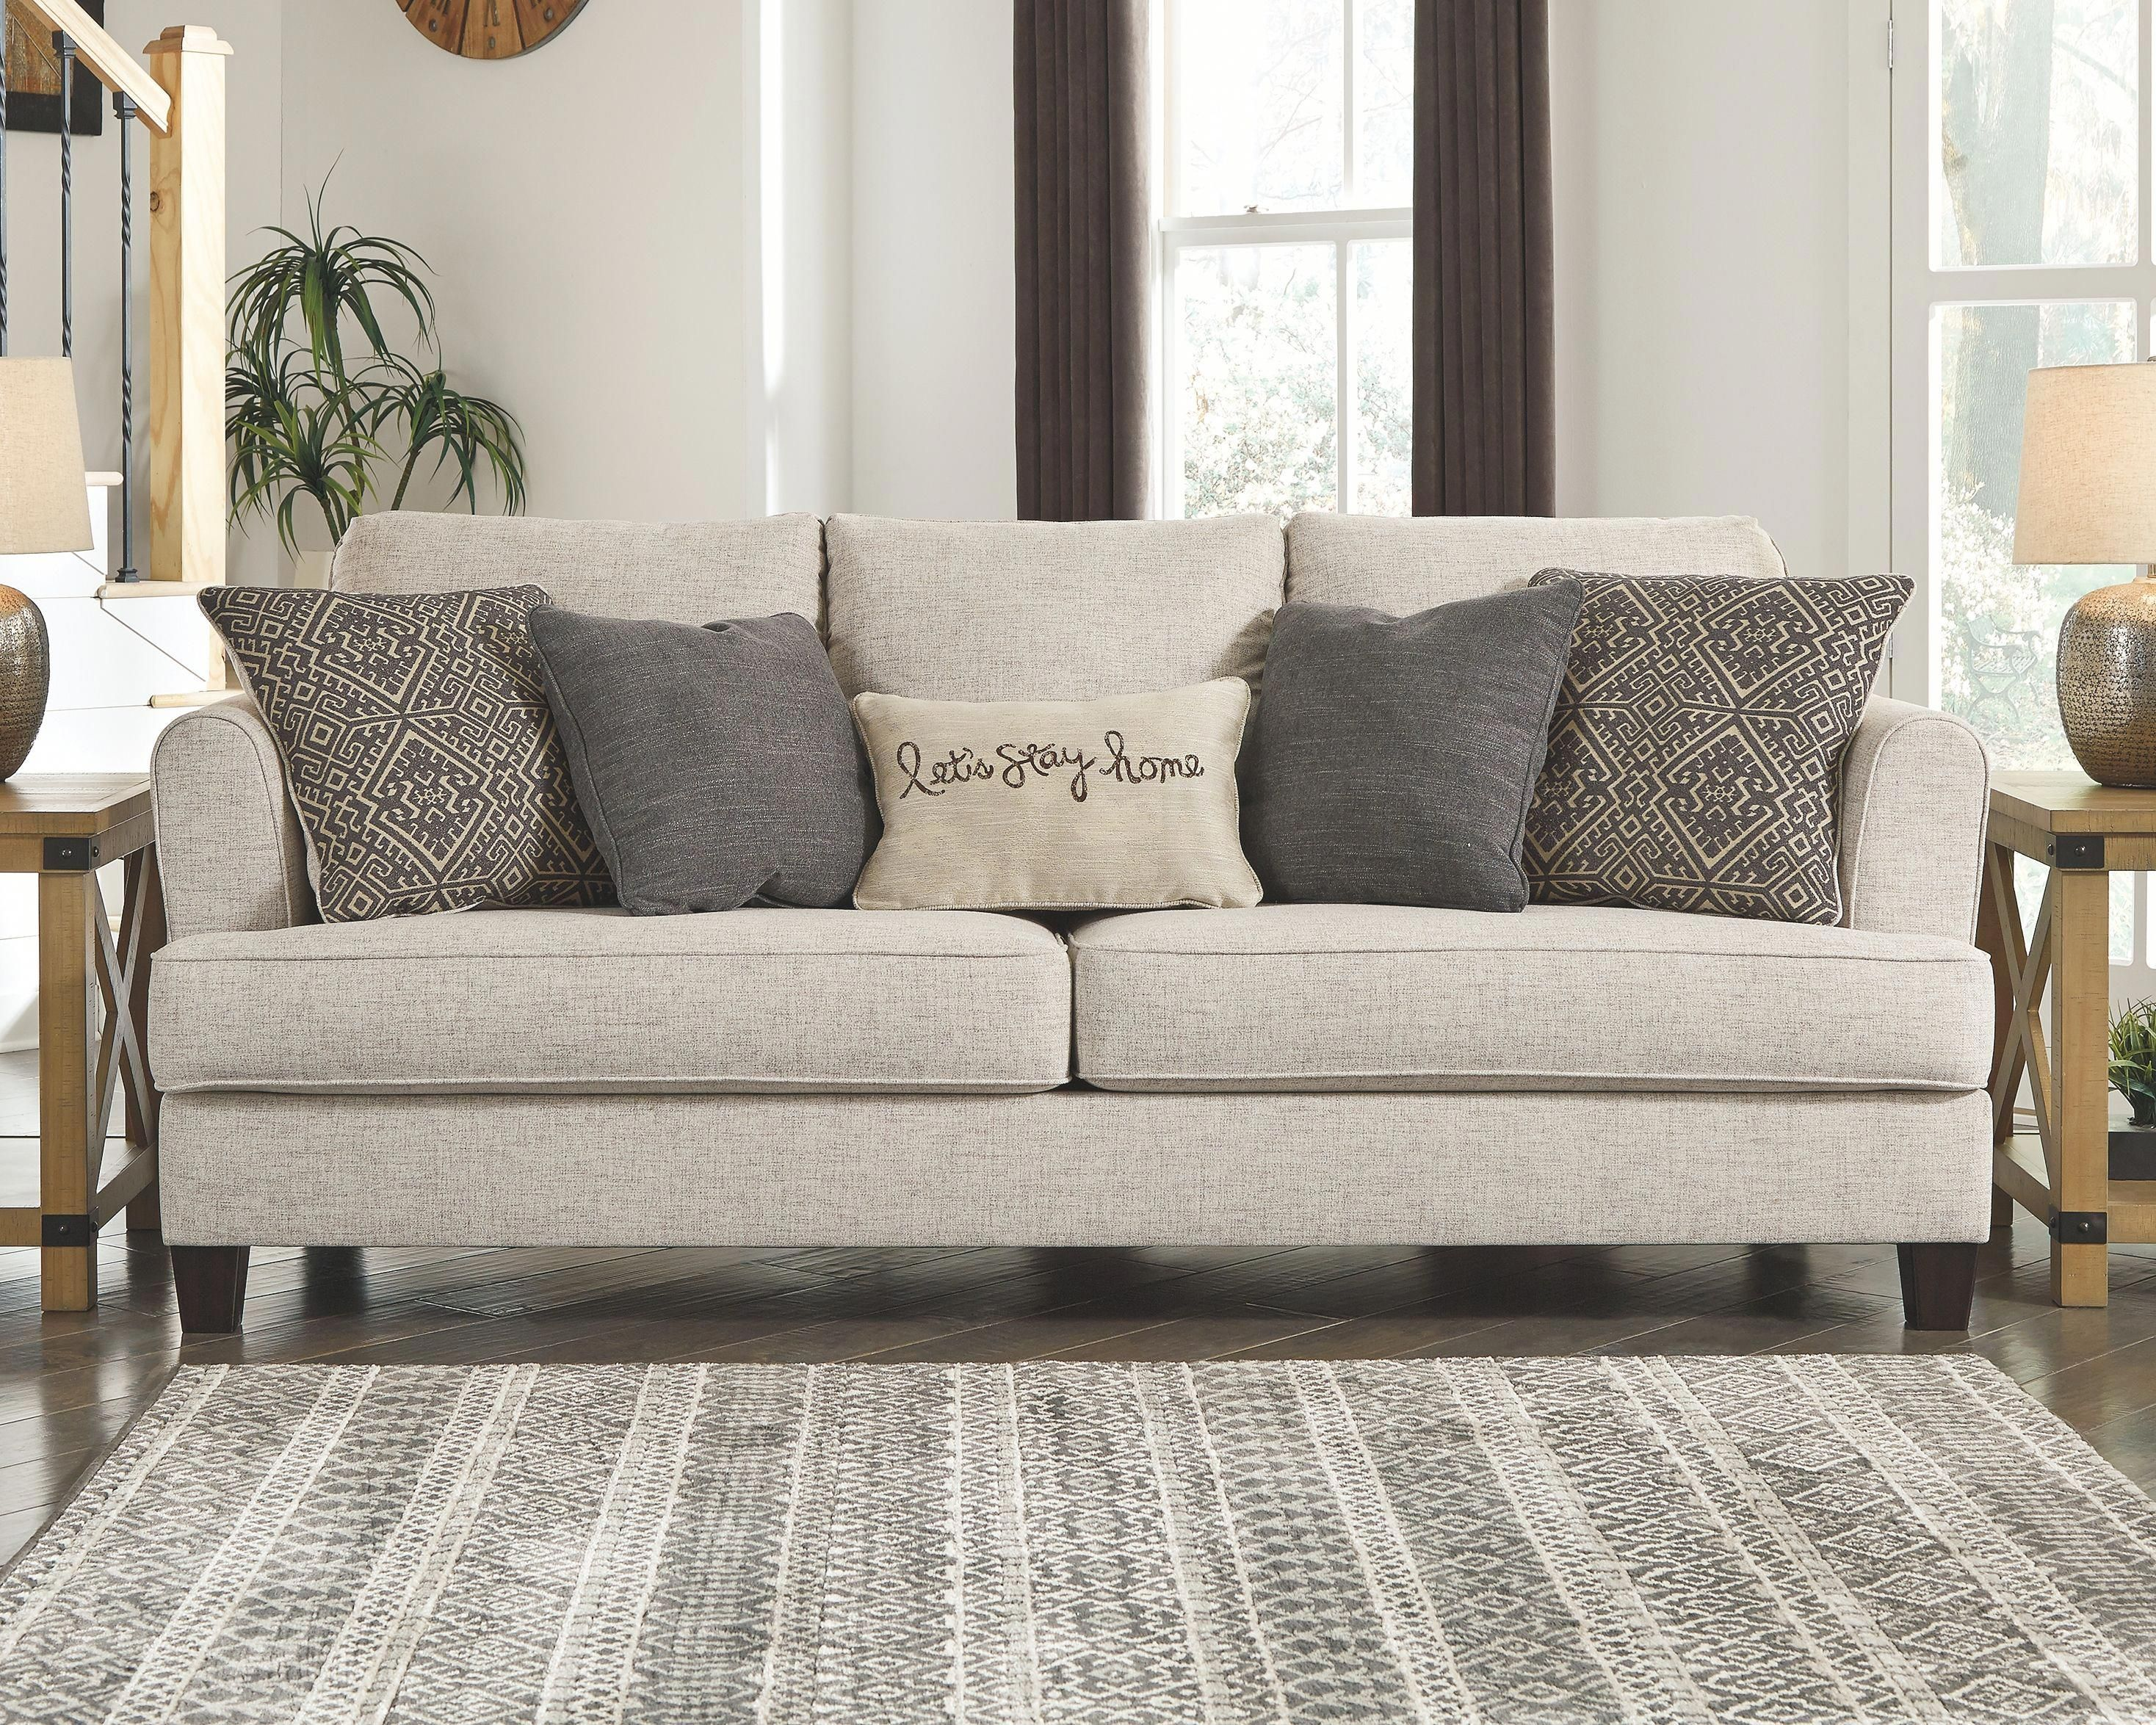 Best Alcona Sofa Linen Livingroomcouch In 2020 Furniture 640 x 480